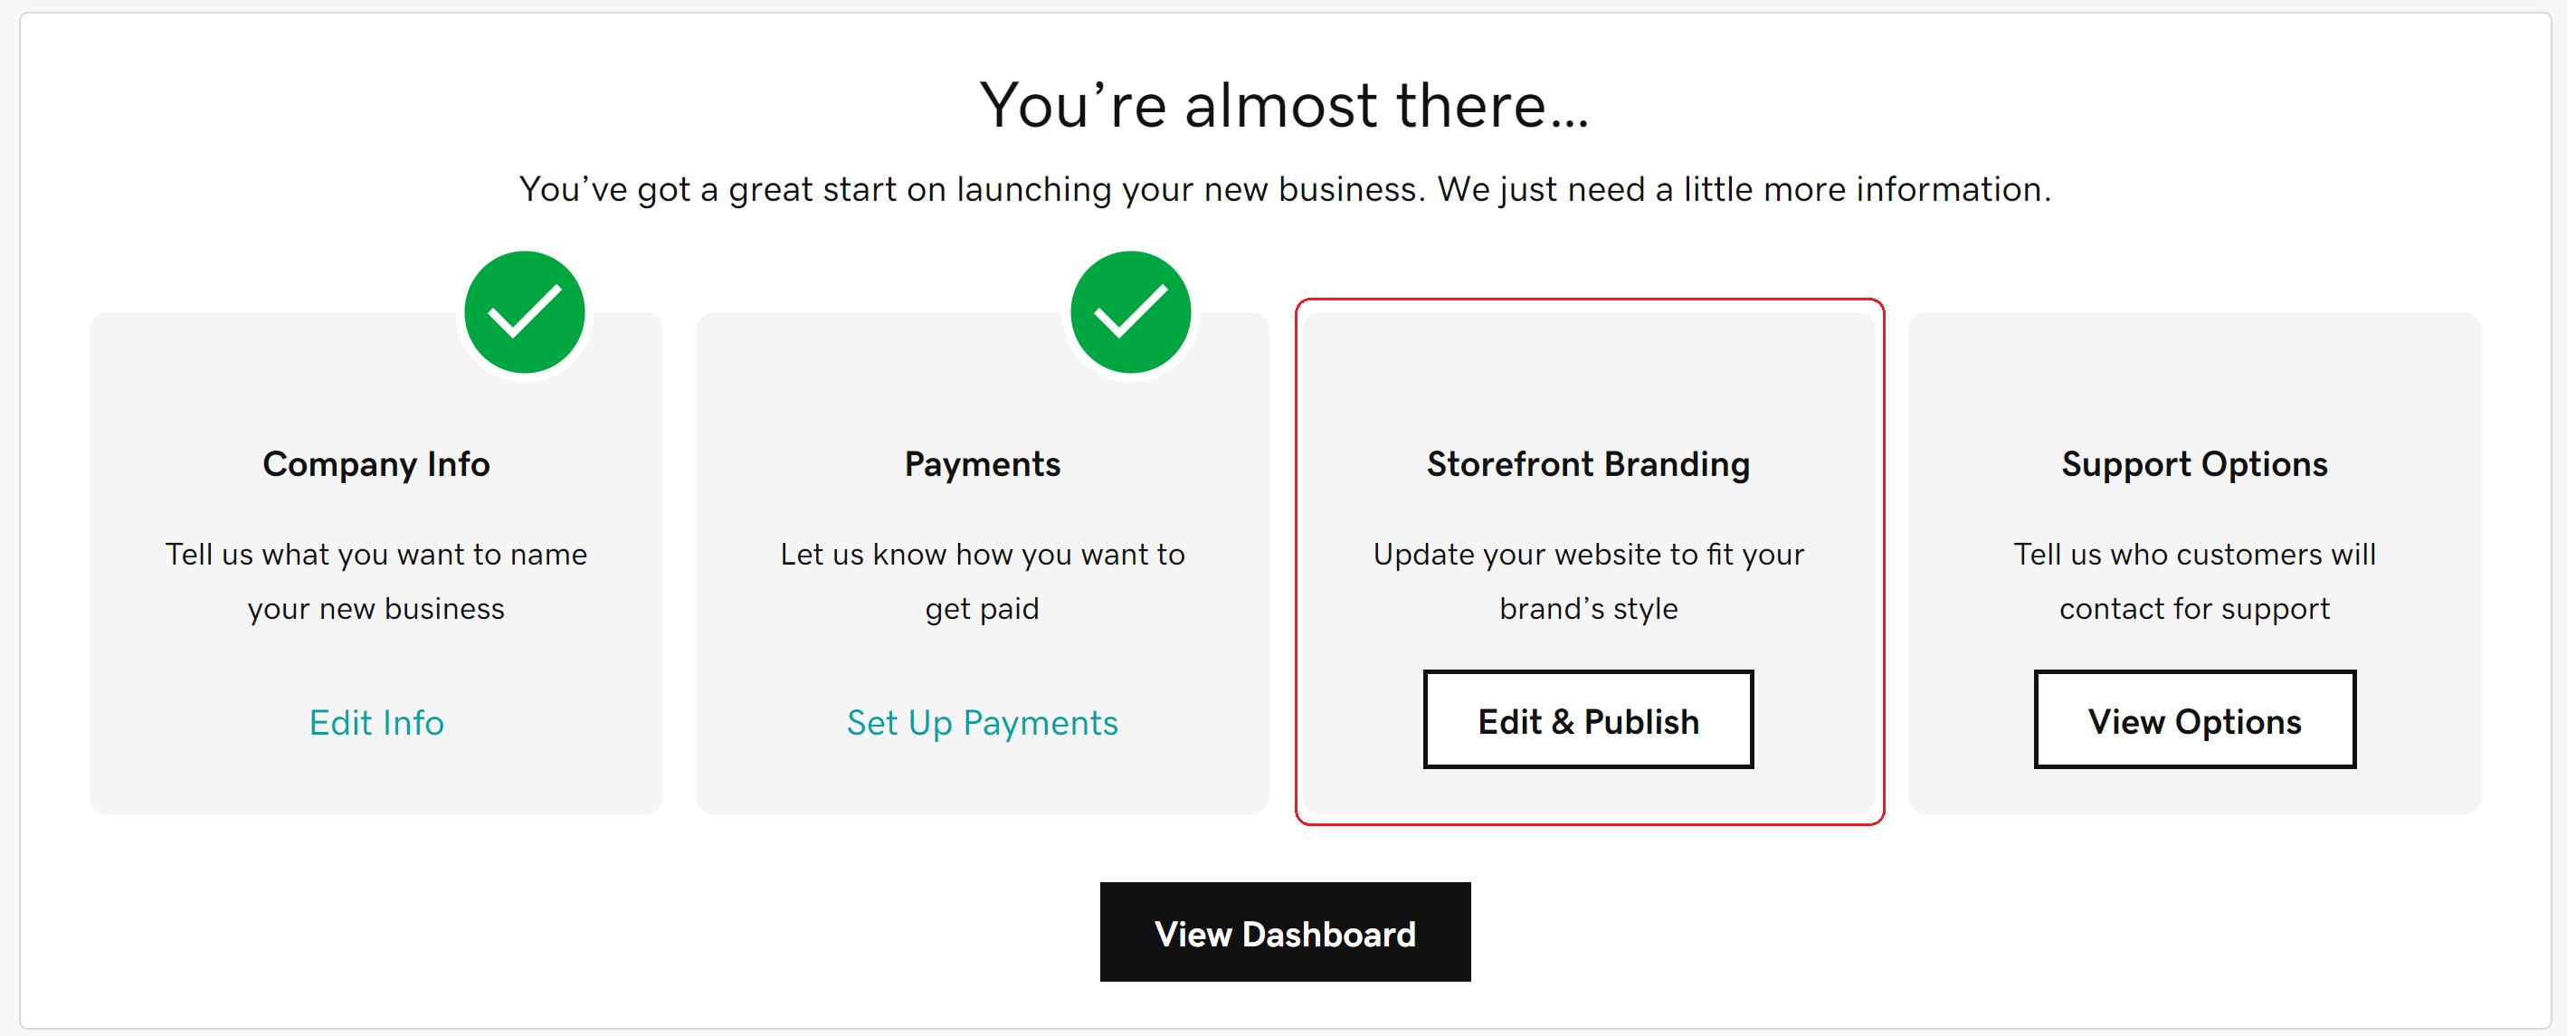 Storefront Branding Button